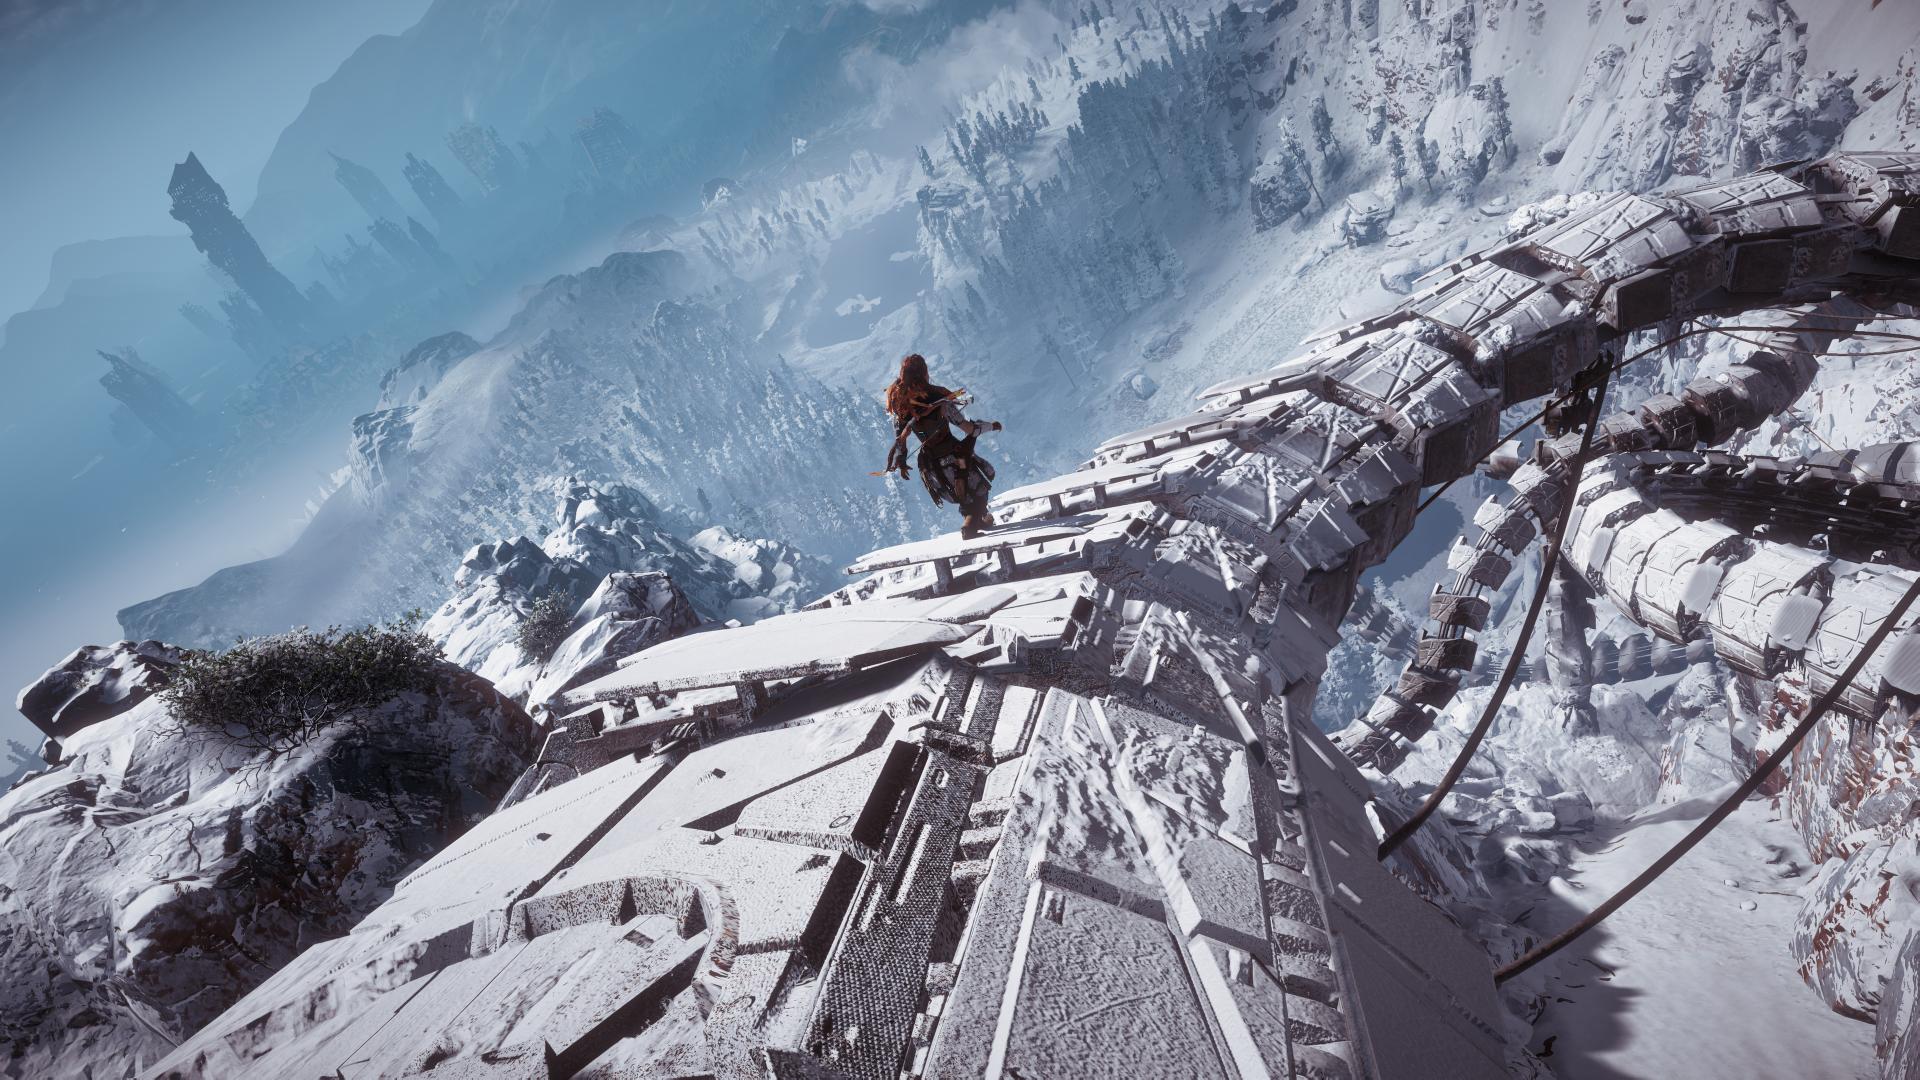 Must see Wallpaper Mountain Horizon - horizon-zero-dawn-19-by-gamephotography-db1topf-horizon-zero-dawn-40311079-1920-1080  Gallery_303771.png